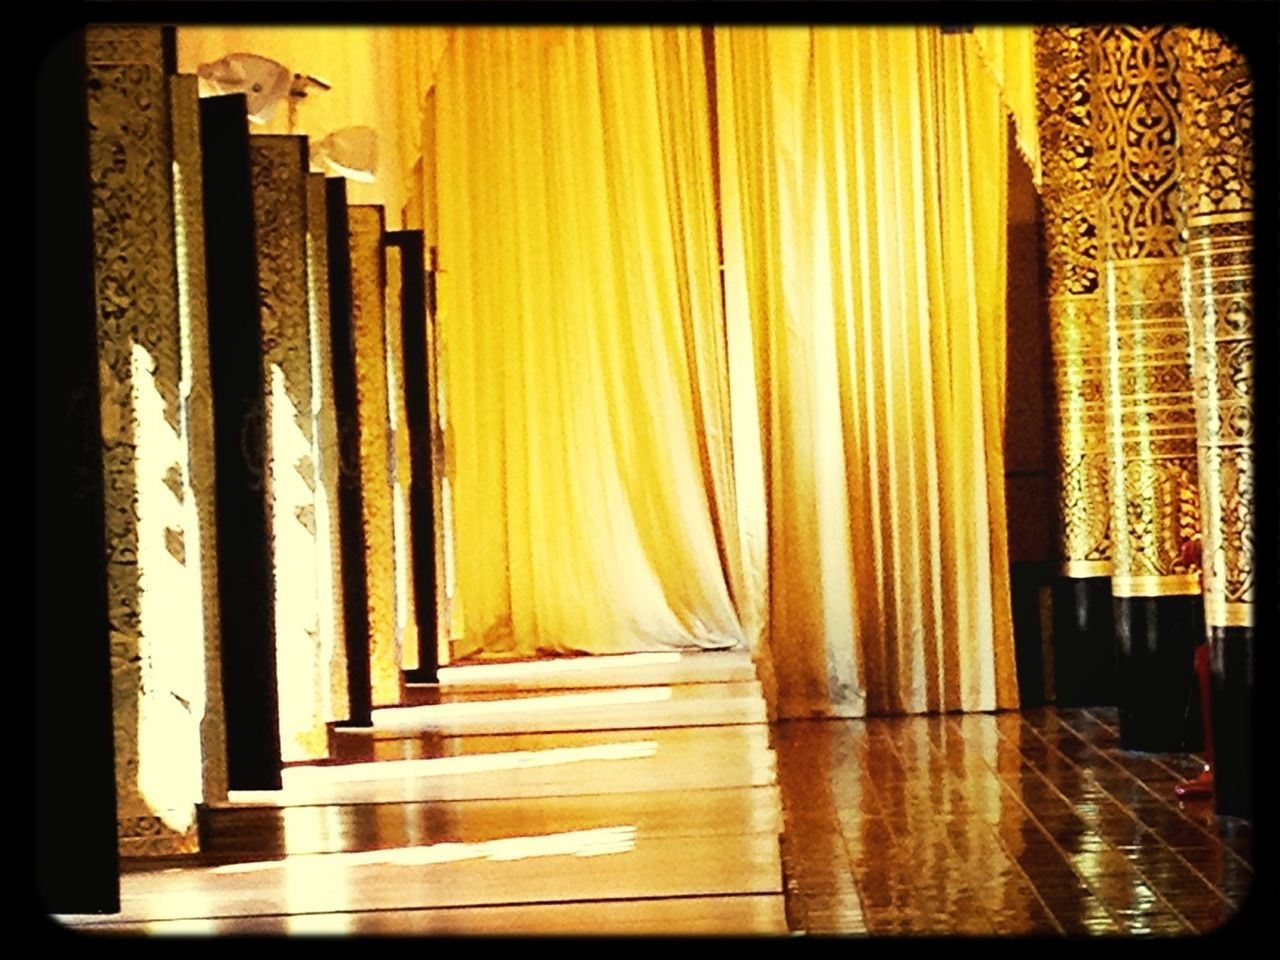 curtain, drapes, indoors, no people, night, illuminated, close-up